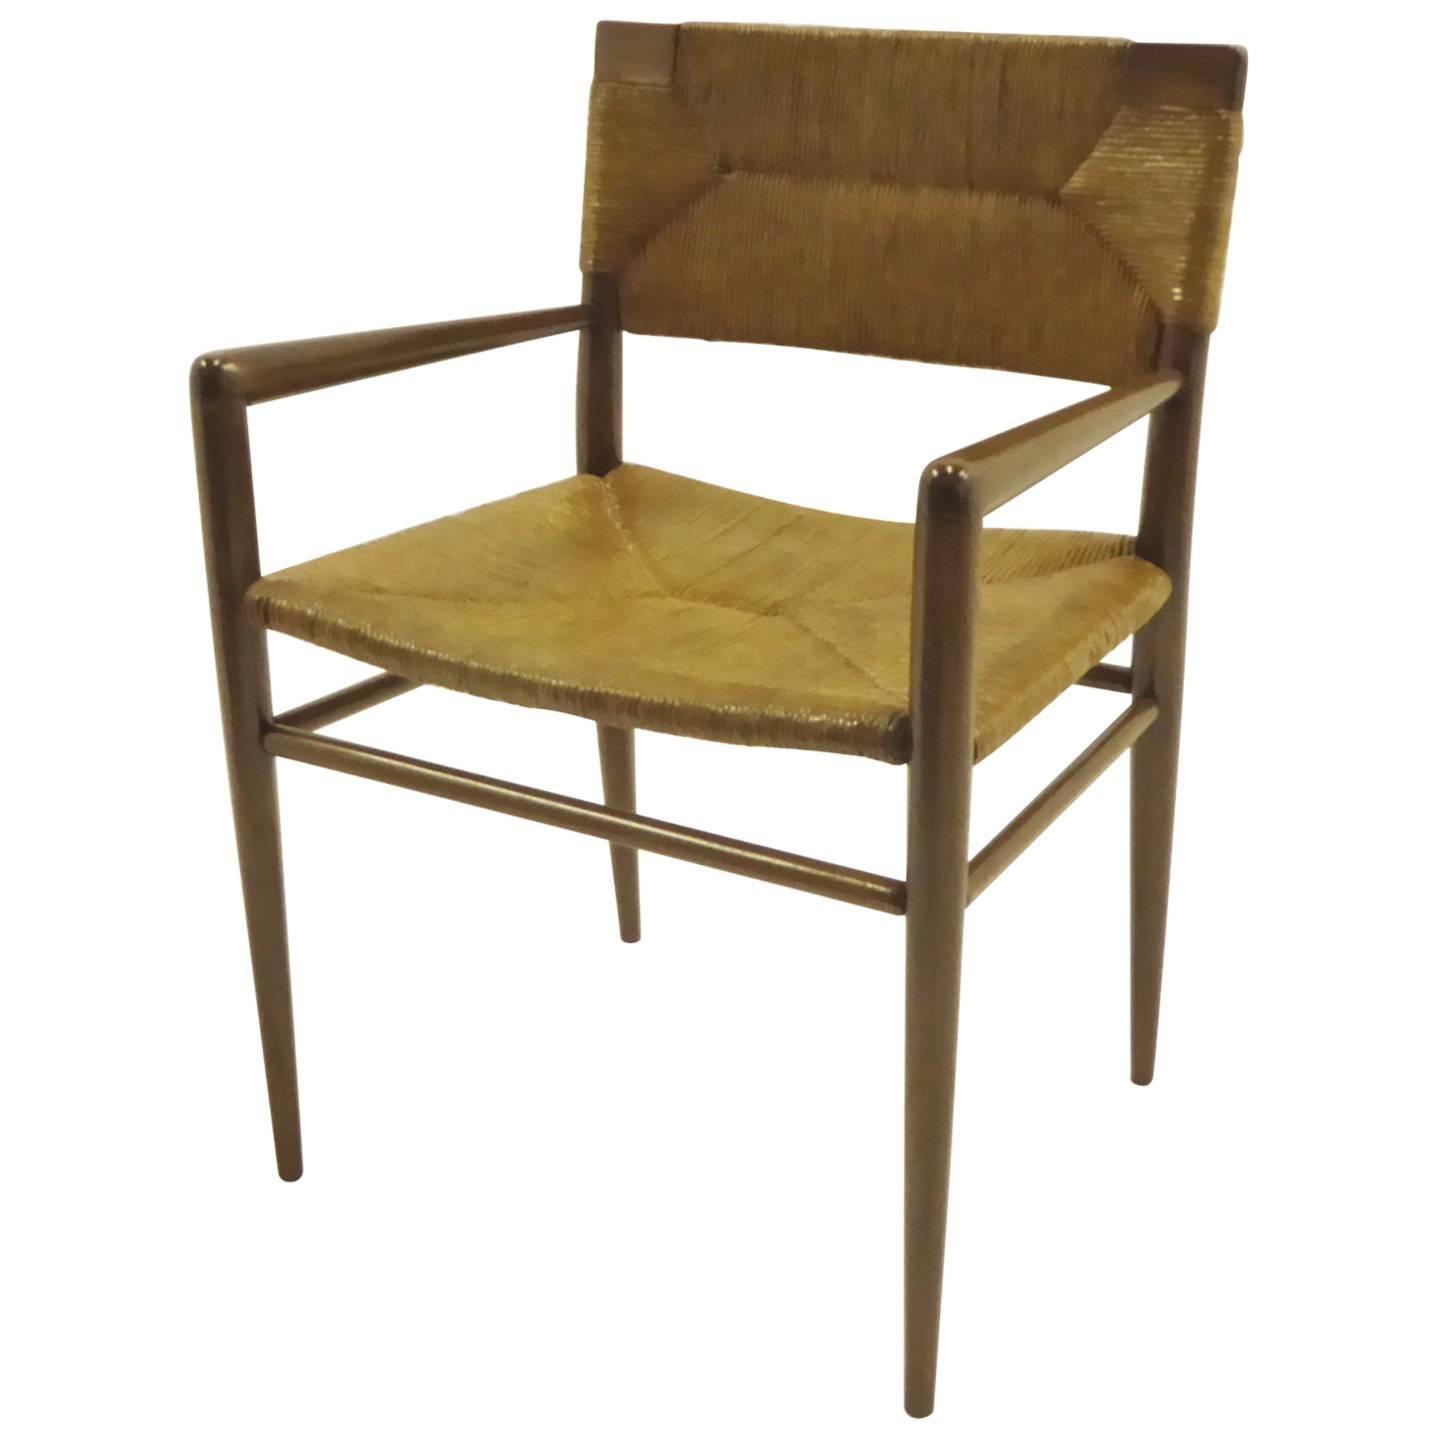 1950s Mel Smilow Danish Modern Woven Rush and Walnut Armchair for Smilow-Thielle